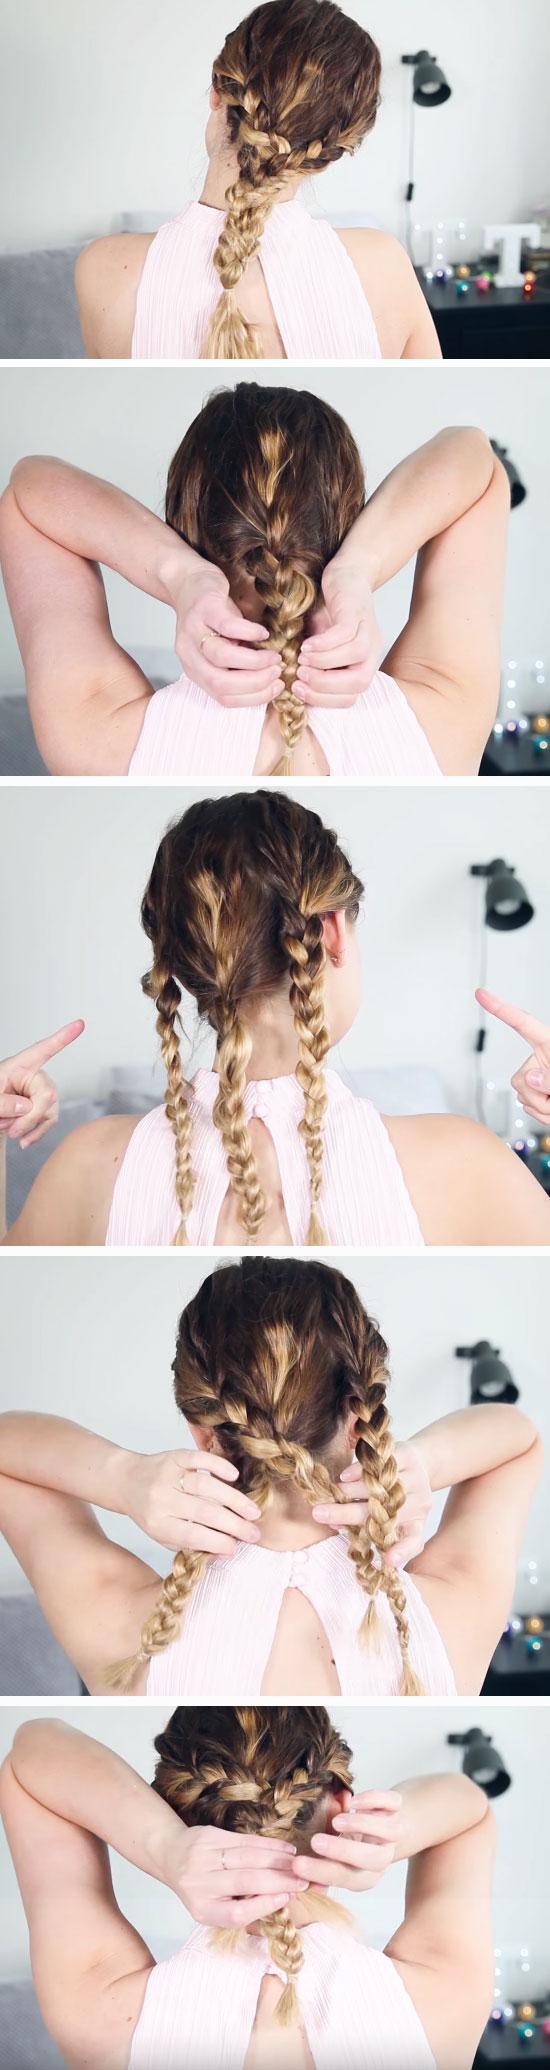 18 Diy Game Of Thrones Inspired Hairstyles Juego De Tronos Pinterest